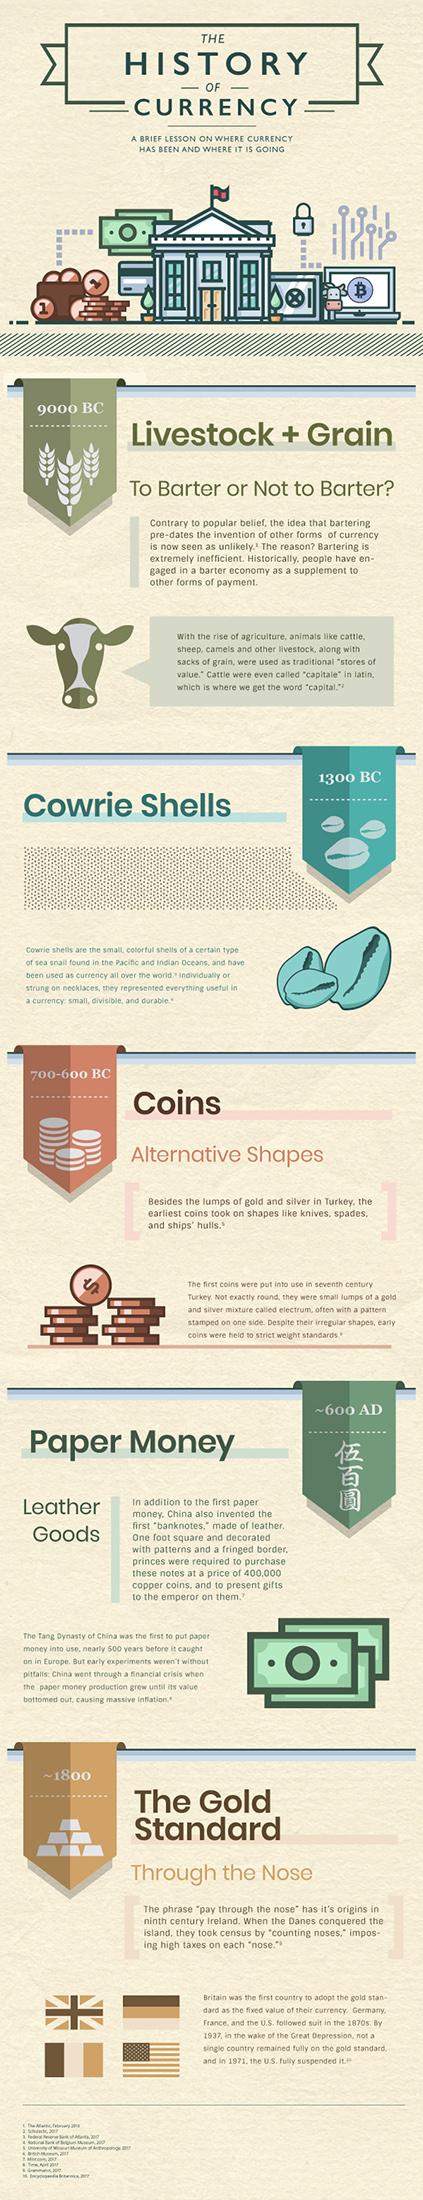 infographic-586-600.jpg